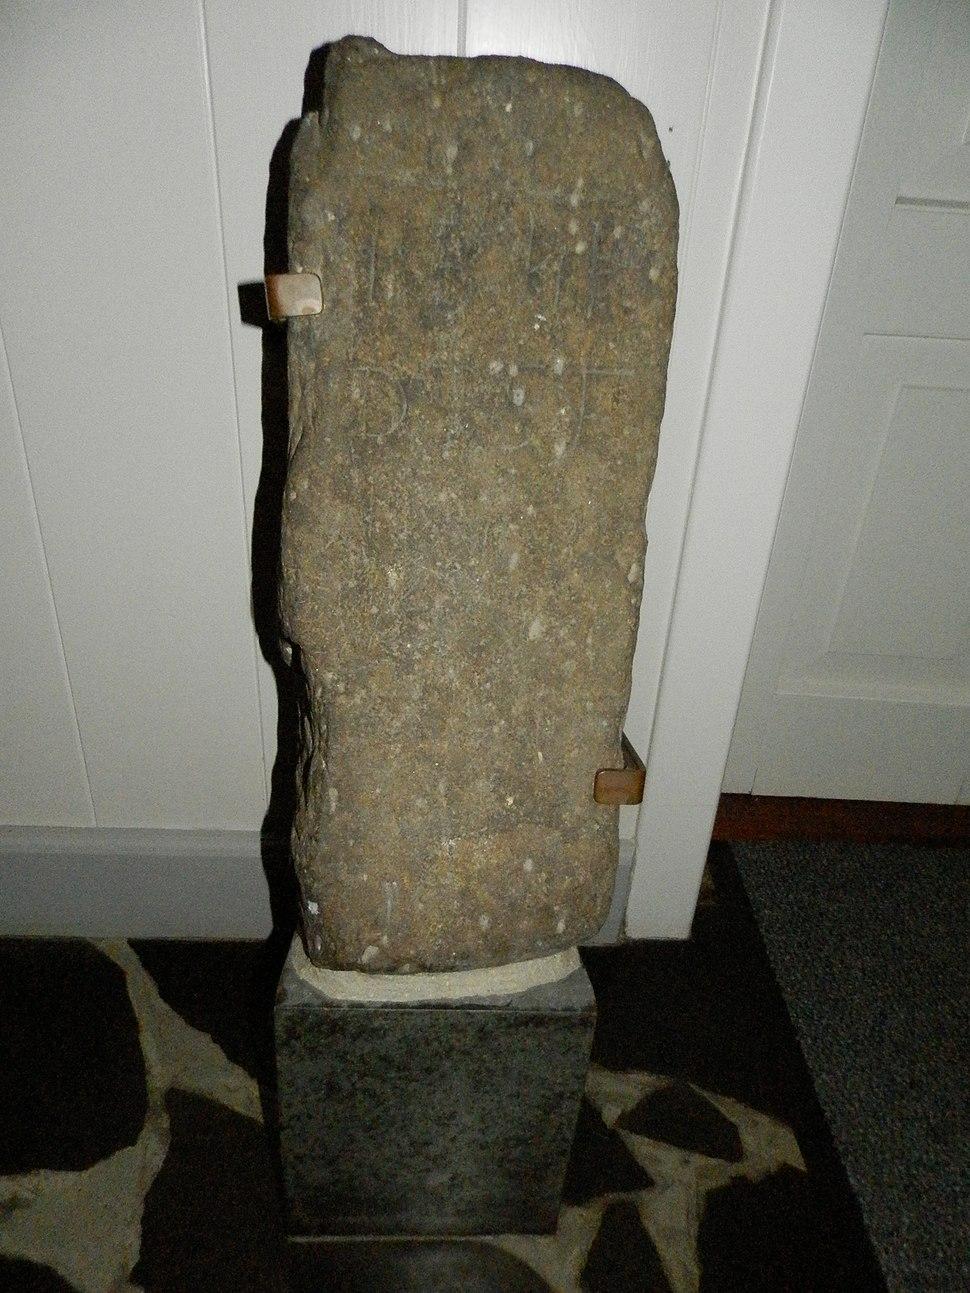 The Famjin Stone a Faroese Runestone